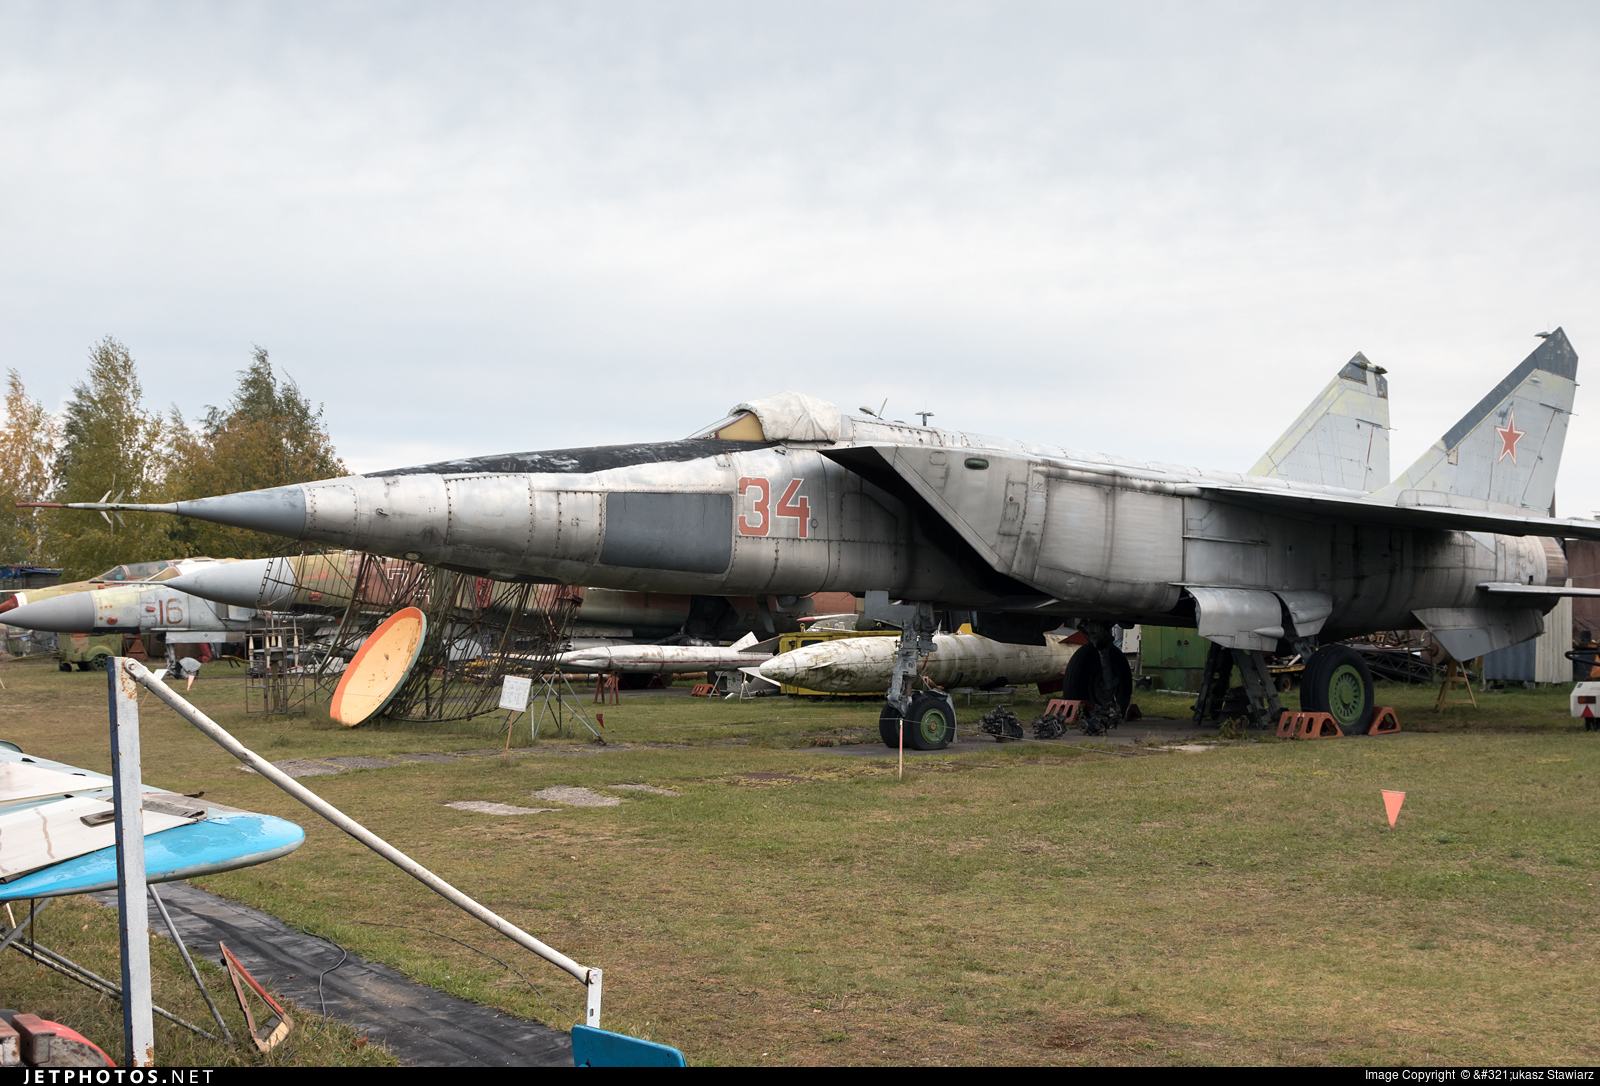 34 - Mikoyan-Gurevich MiG-25 Foxbat - Russia - Air Force